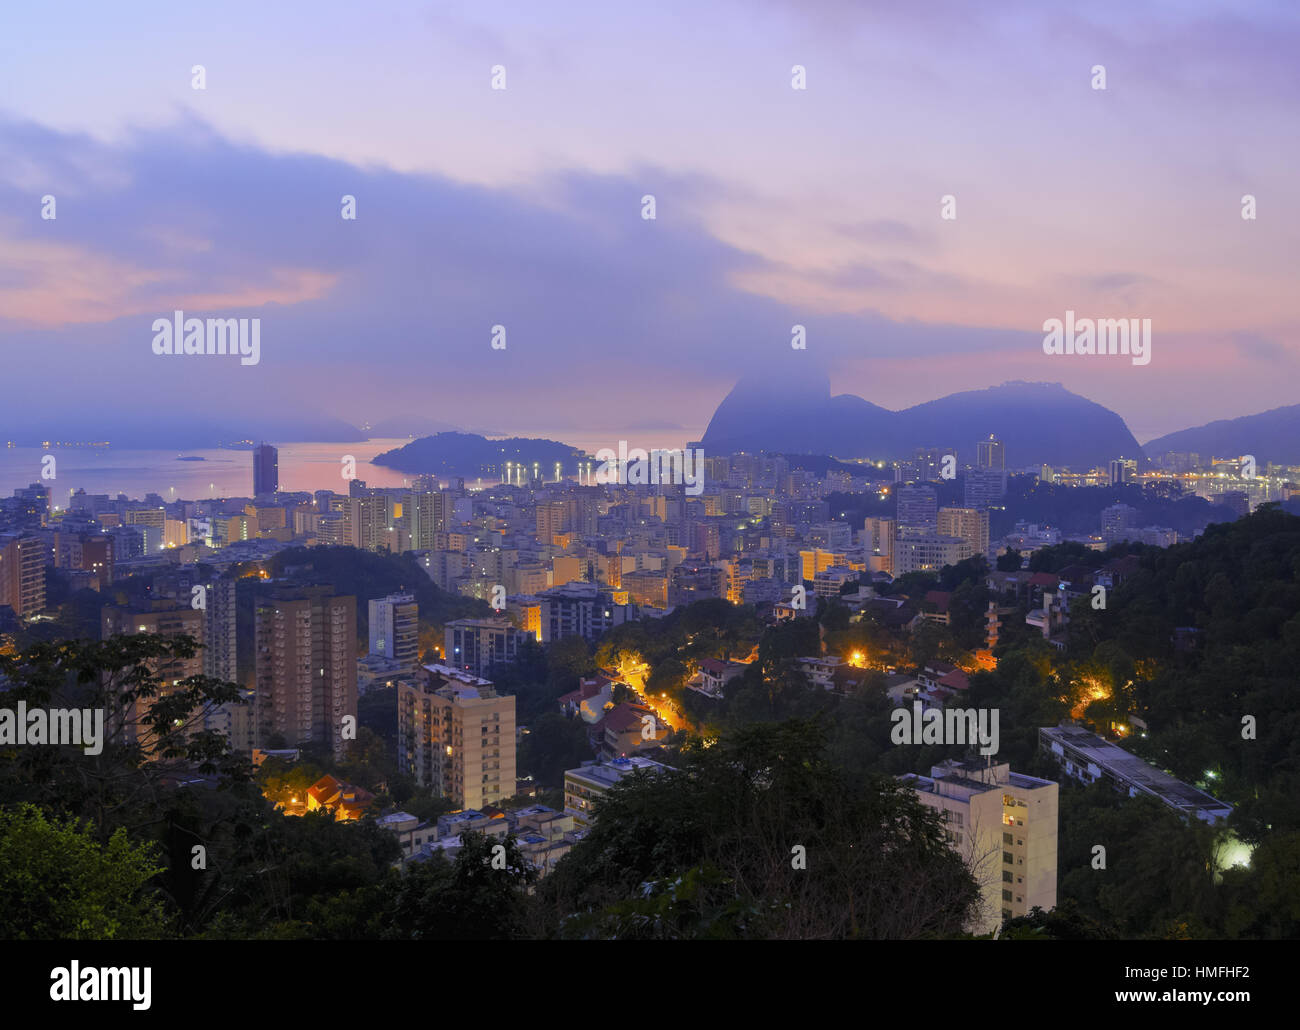 Twilight view over Laranjeiras towards Sugarloaf Mountain, Pereira da Silva, Rio de Janeiro, Brazil, South America - Stock Image